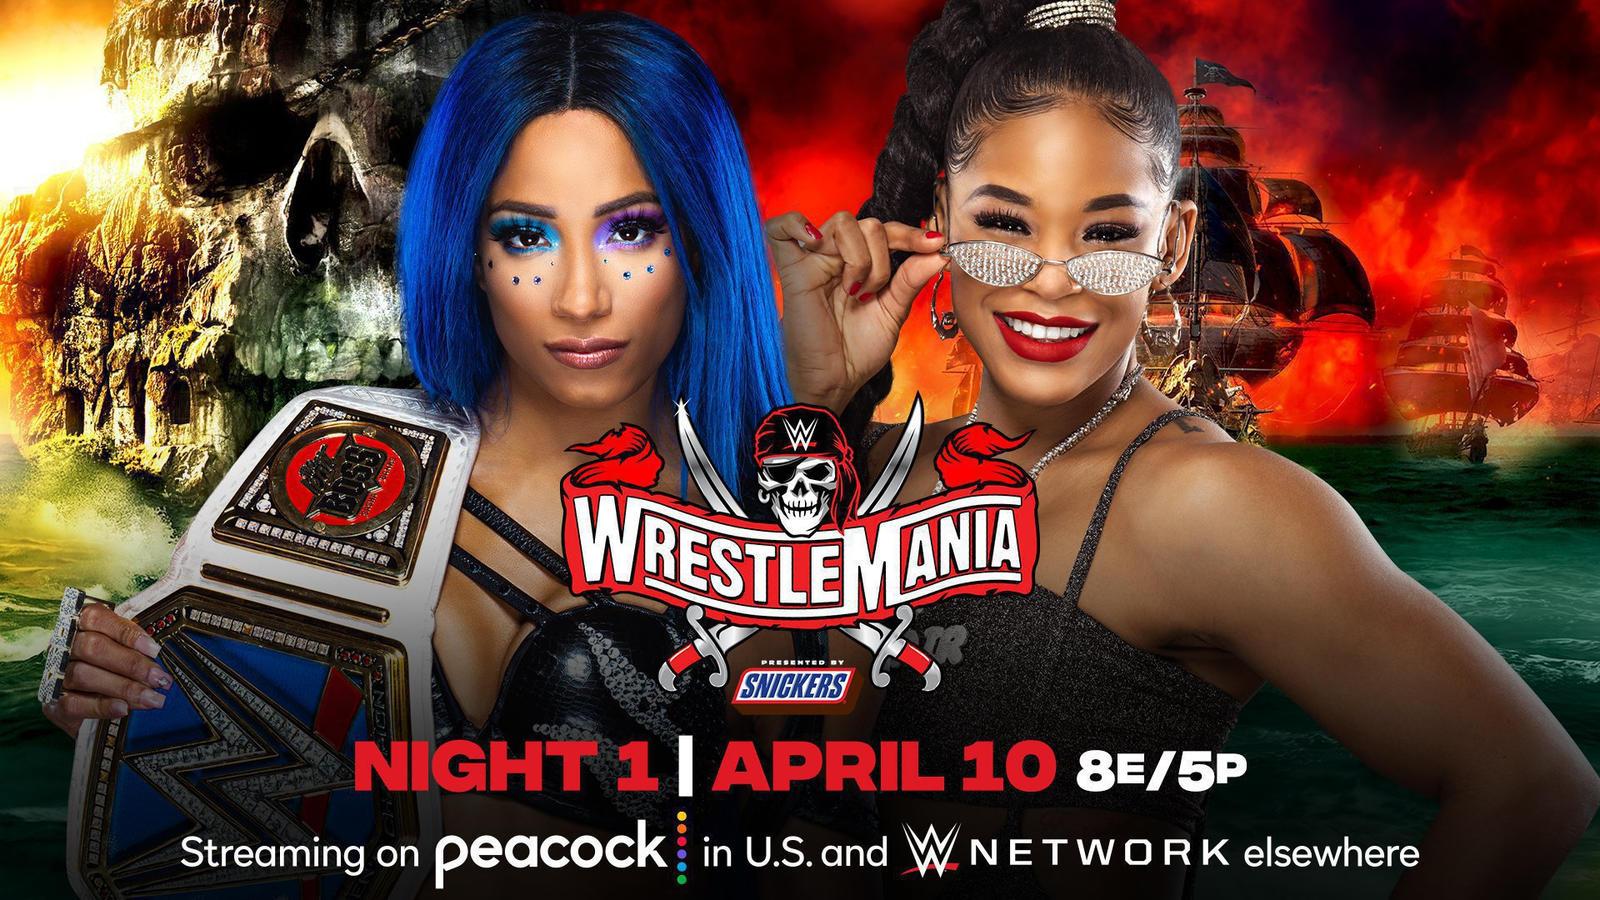 Sasha Banks vs Bianca Belair to Main Event WrestleMania 37 Night 1